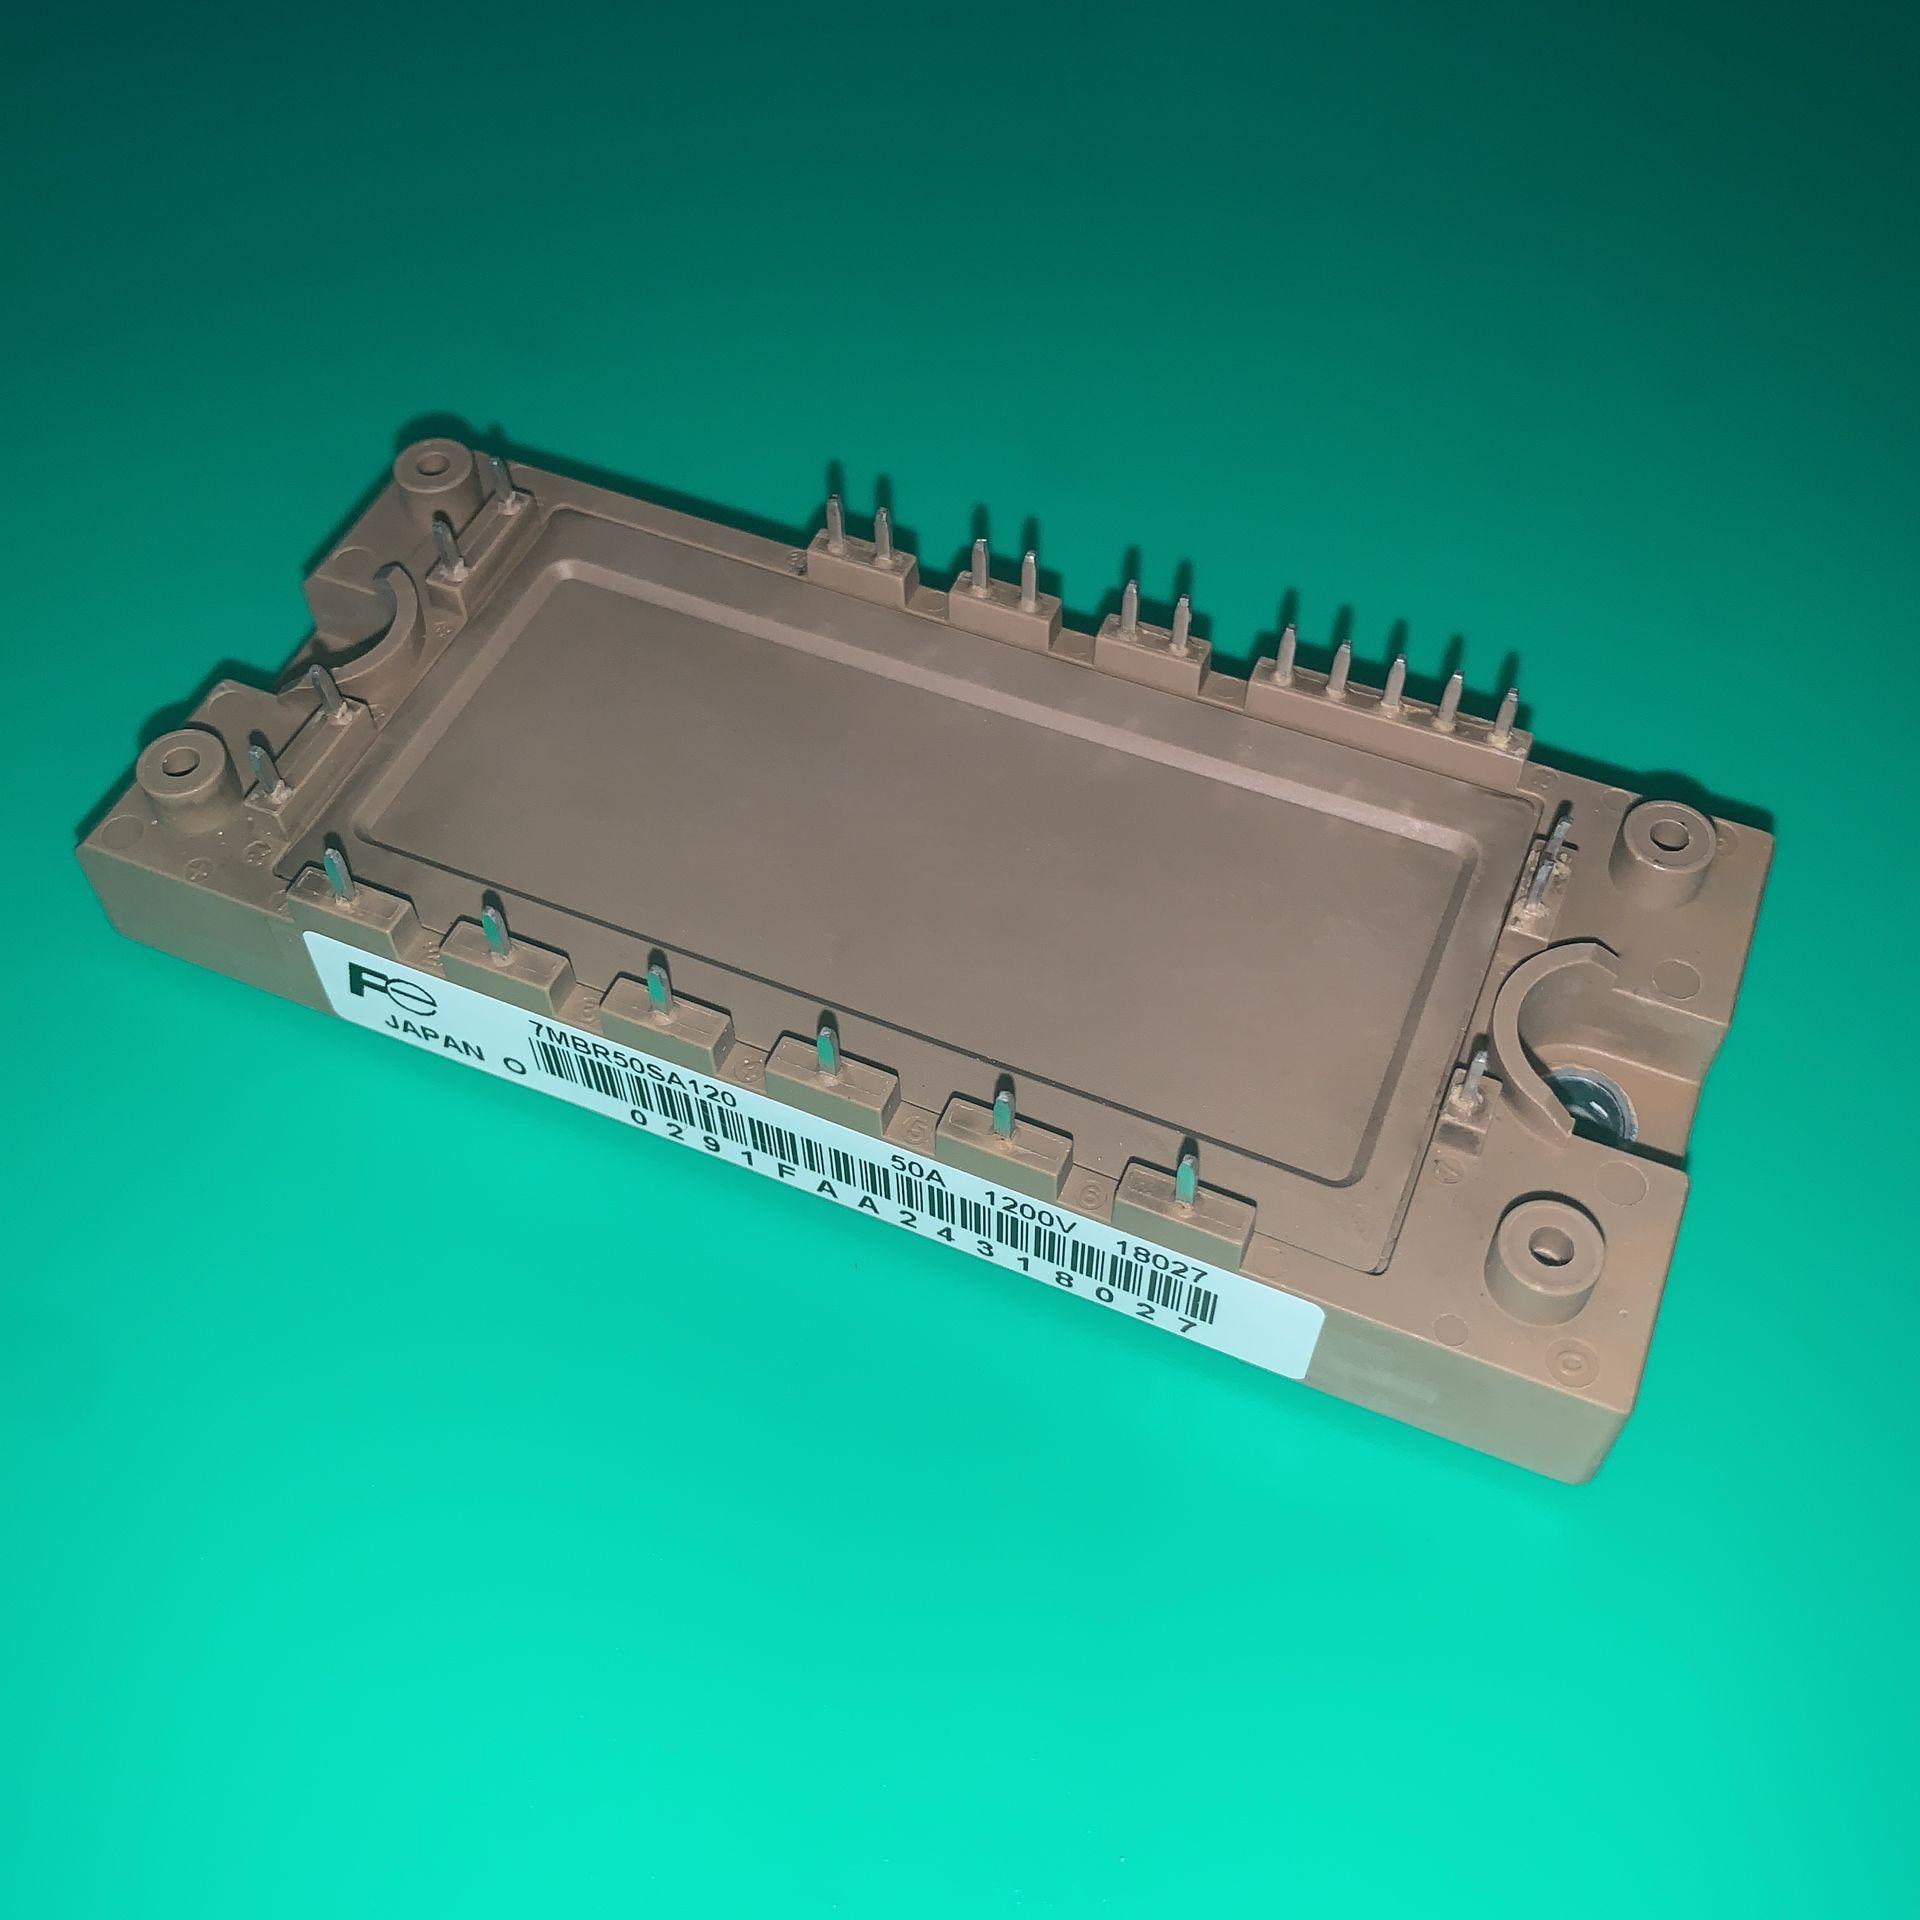 7MBR50SA120 وحدة 50A 1200V 7MBR50S A120 IGBT 7MBR50SA-120 7MBR50 SA120 7MBR 50SA120 7 MBR50SA120 7 MB R50SA120